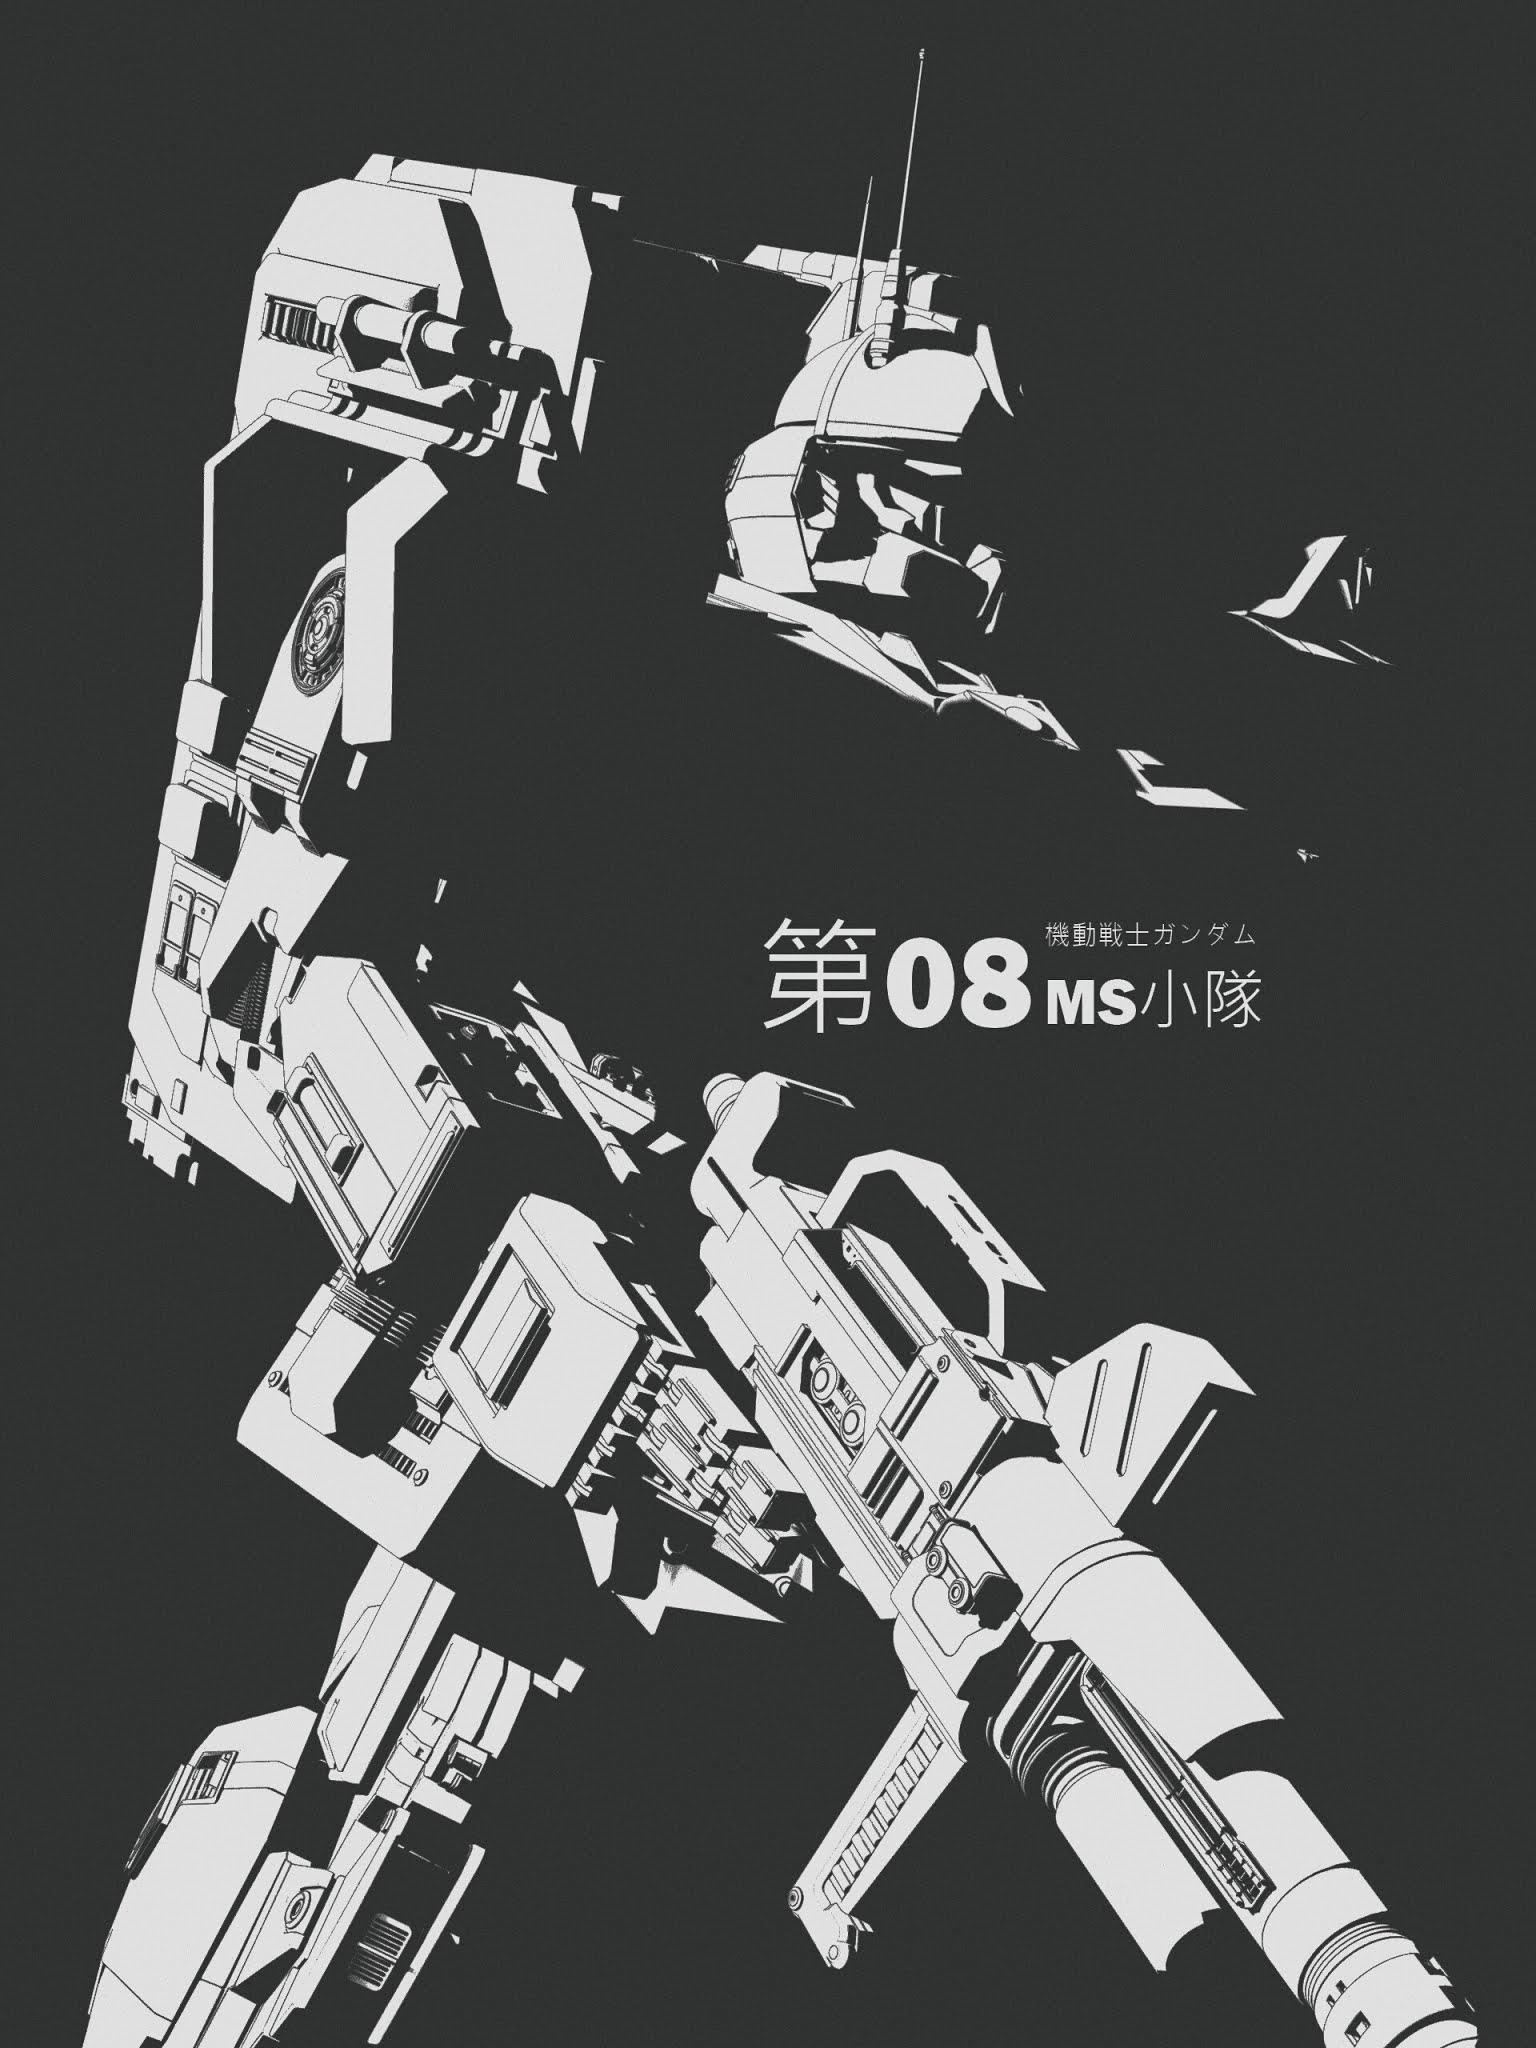 Mecha#Hard Surface#gundam#gunpla#mech#mecha#anime#robot#japan